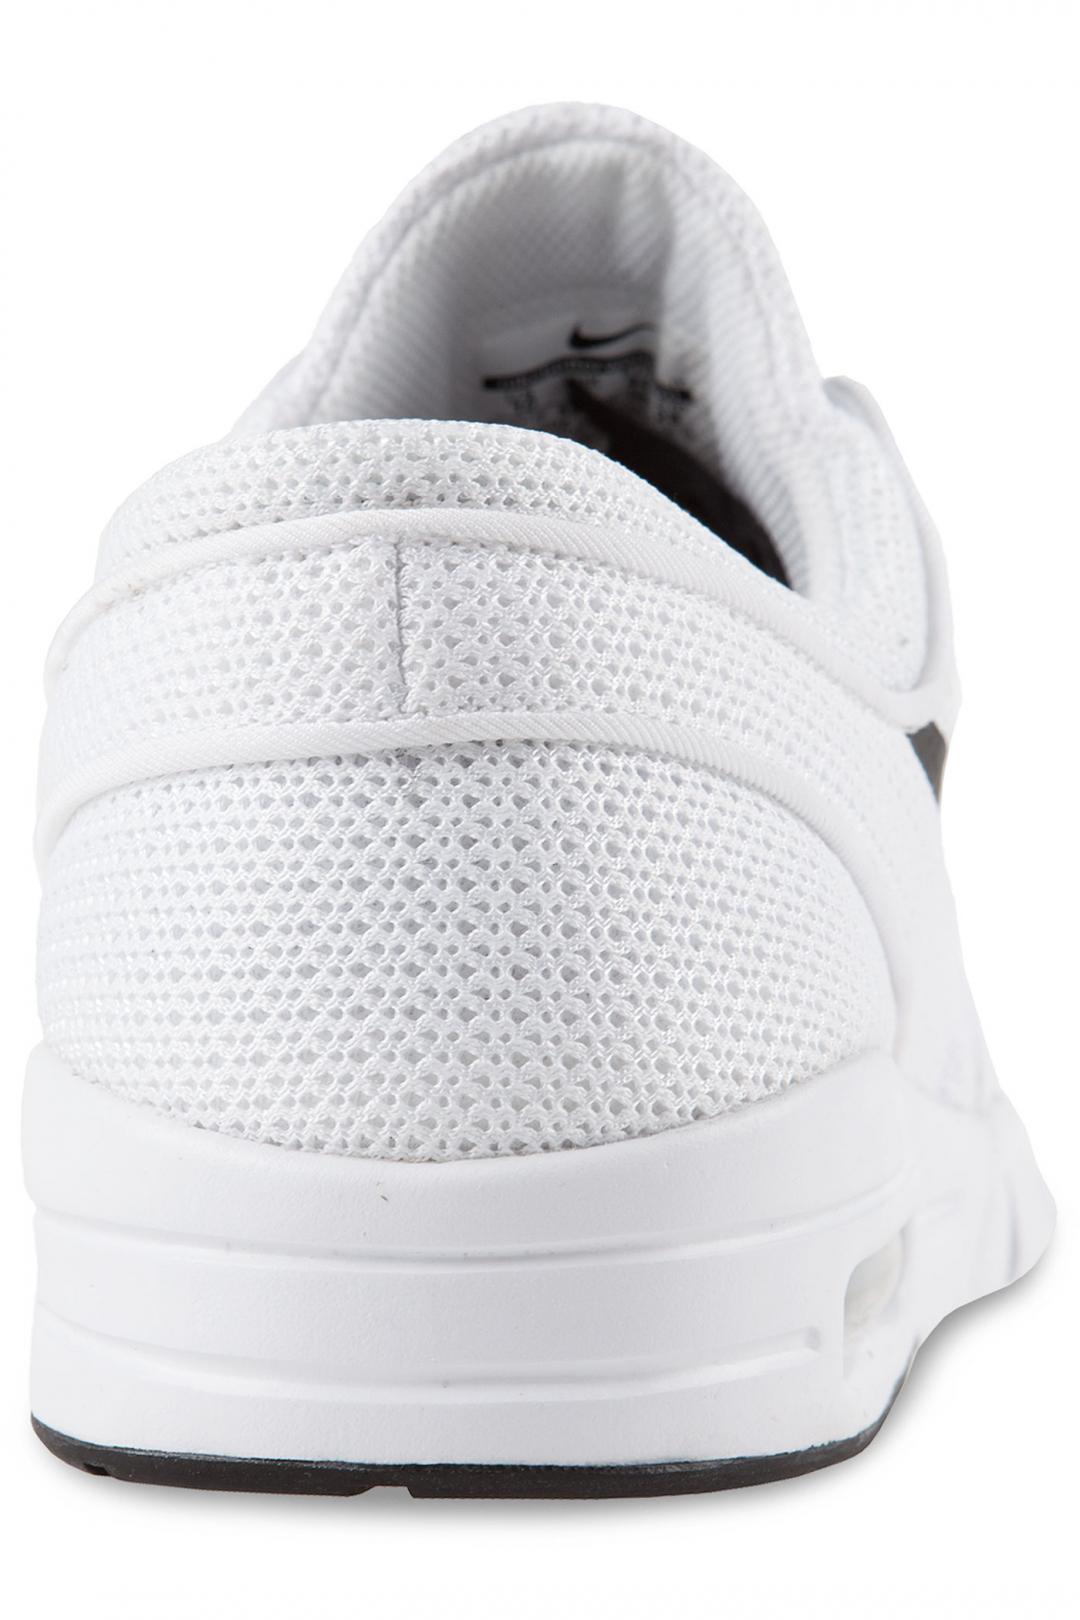 Uomo/Donna Nike SB Stefan Janoski Max white black | Sneakers low top